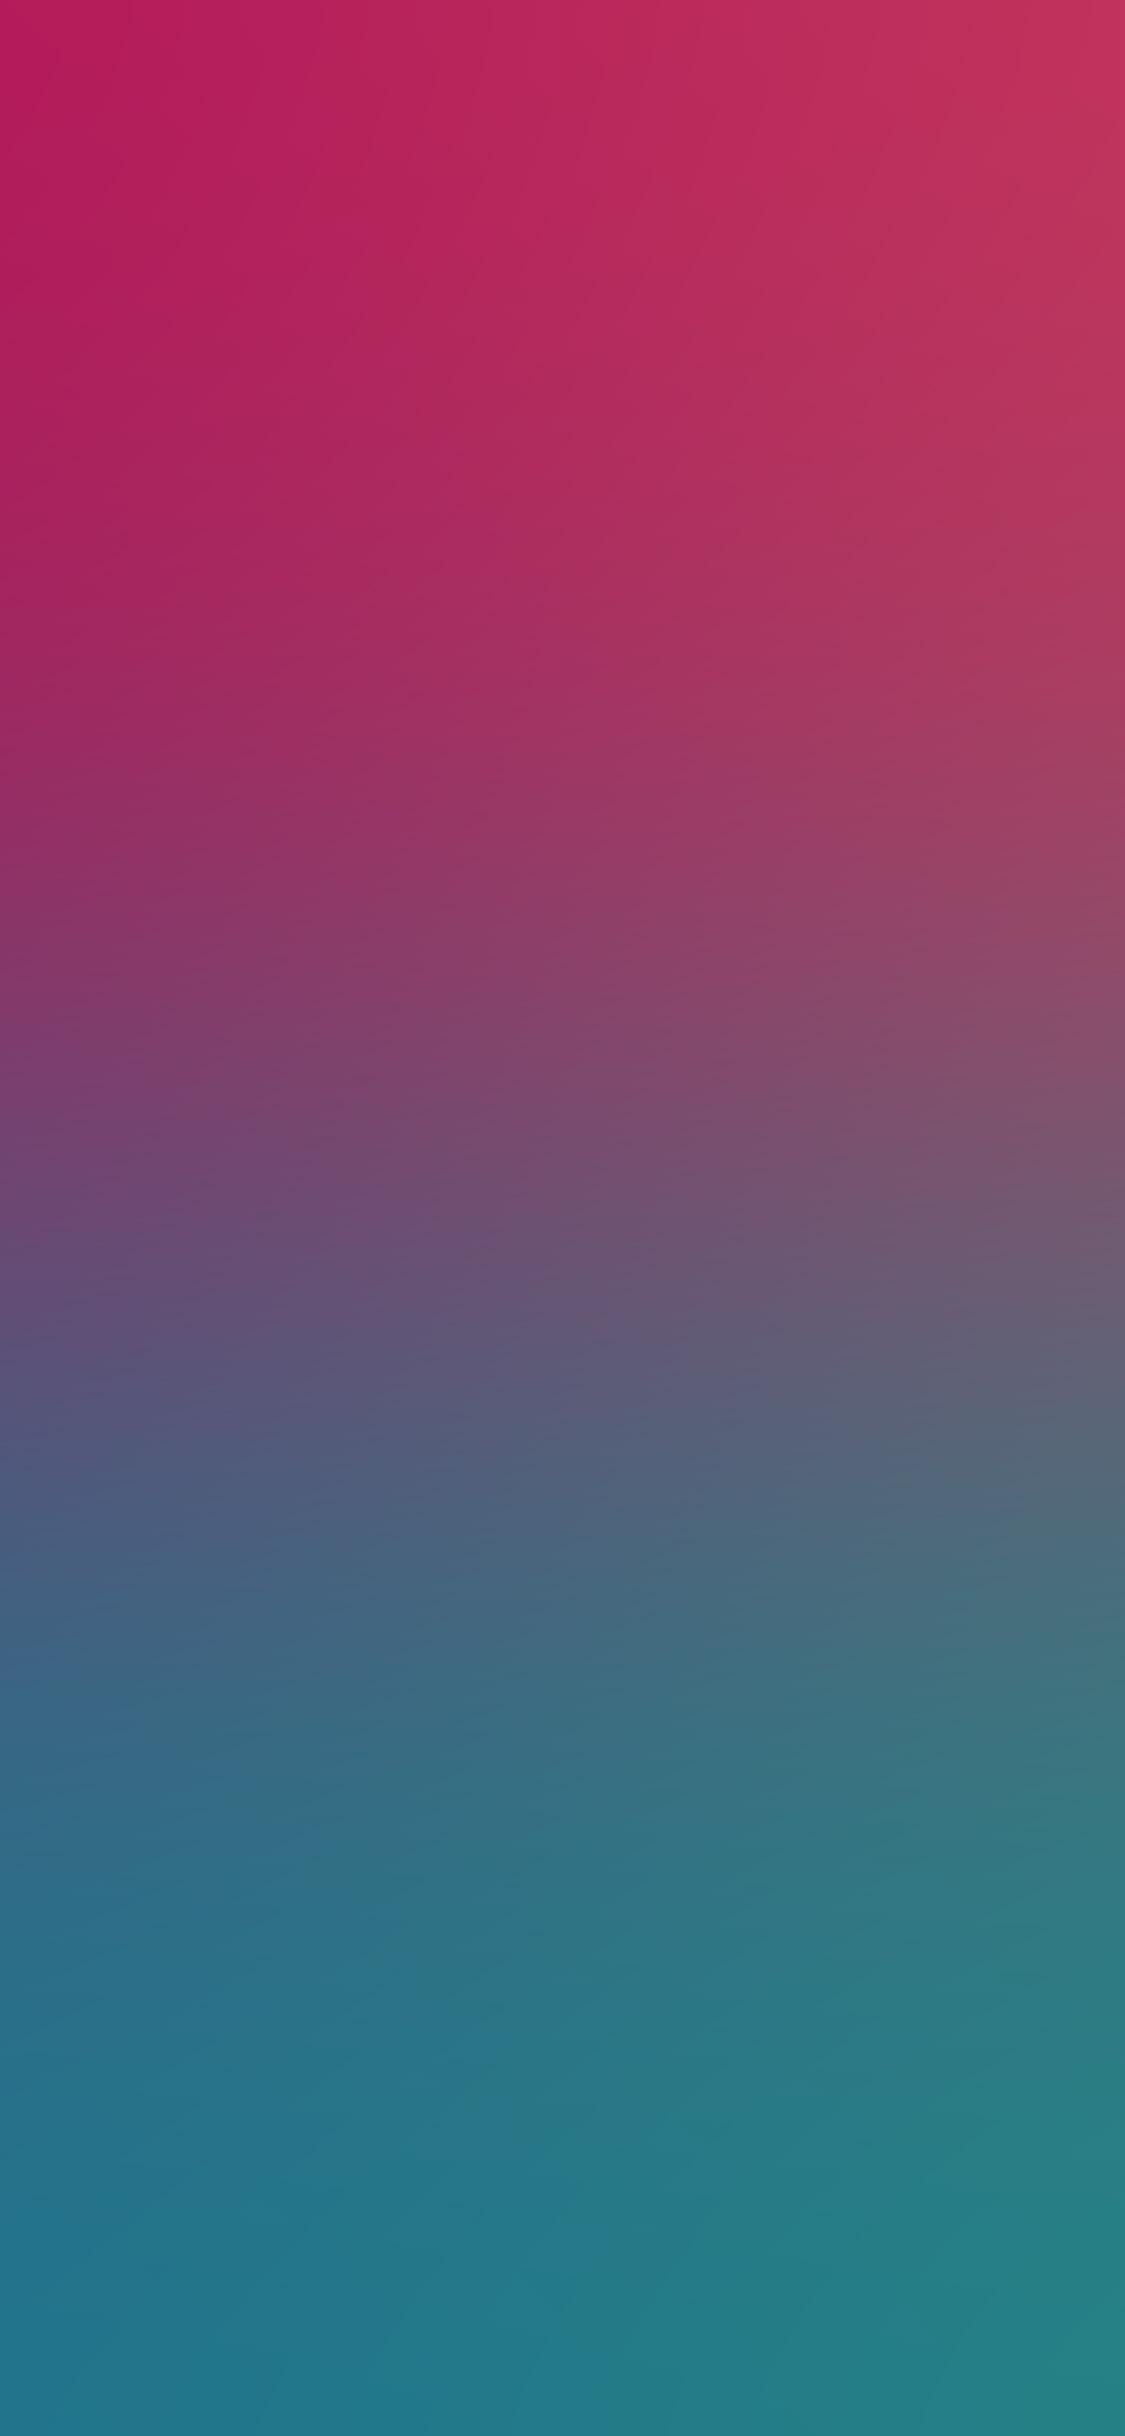 iPhonexpapers.com-Apple-iPhone-wallpaper-sn76-green-pink-blur-gradation